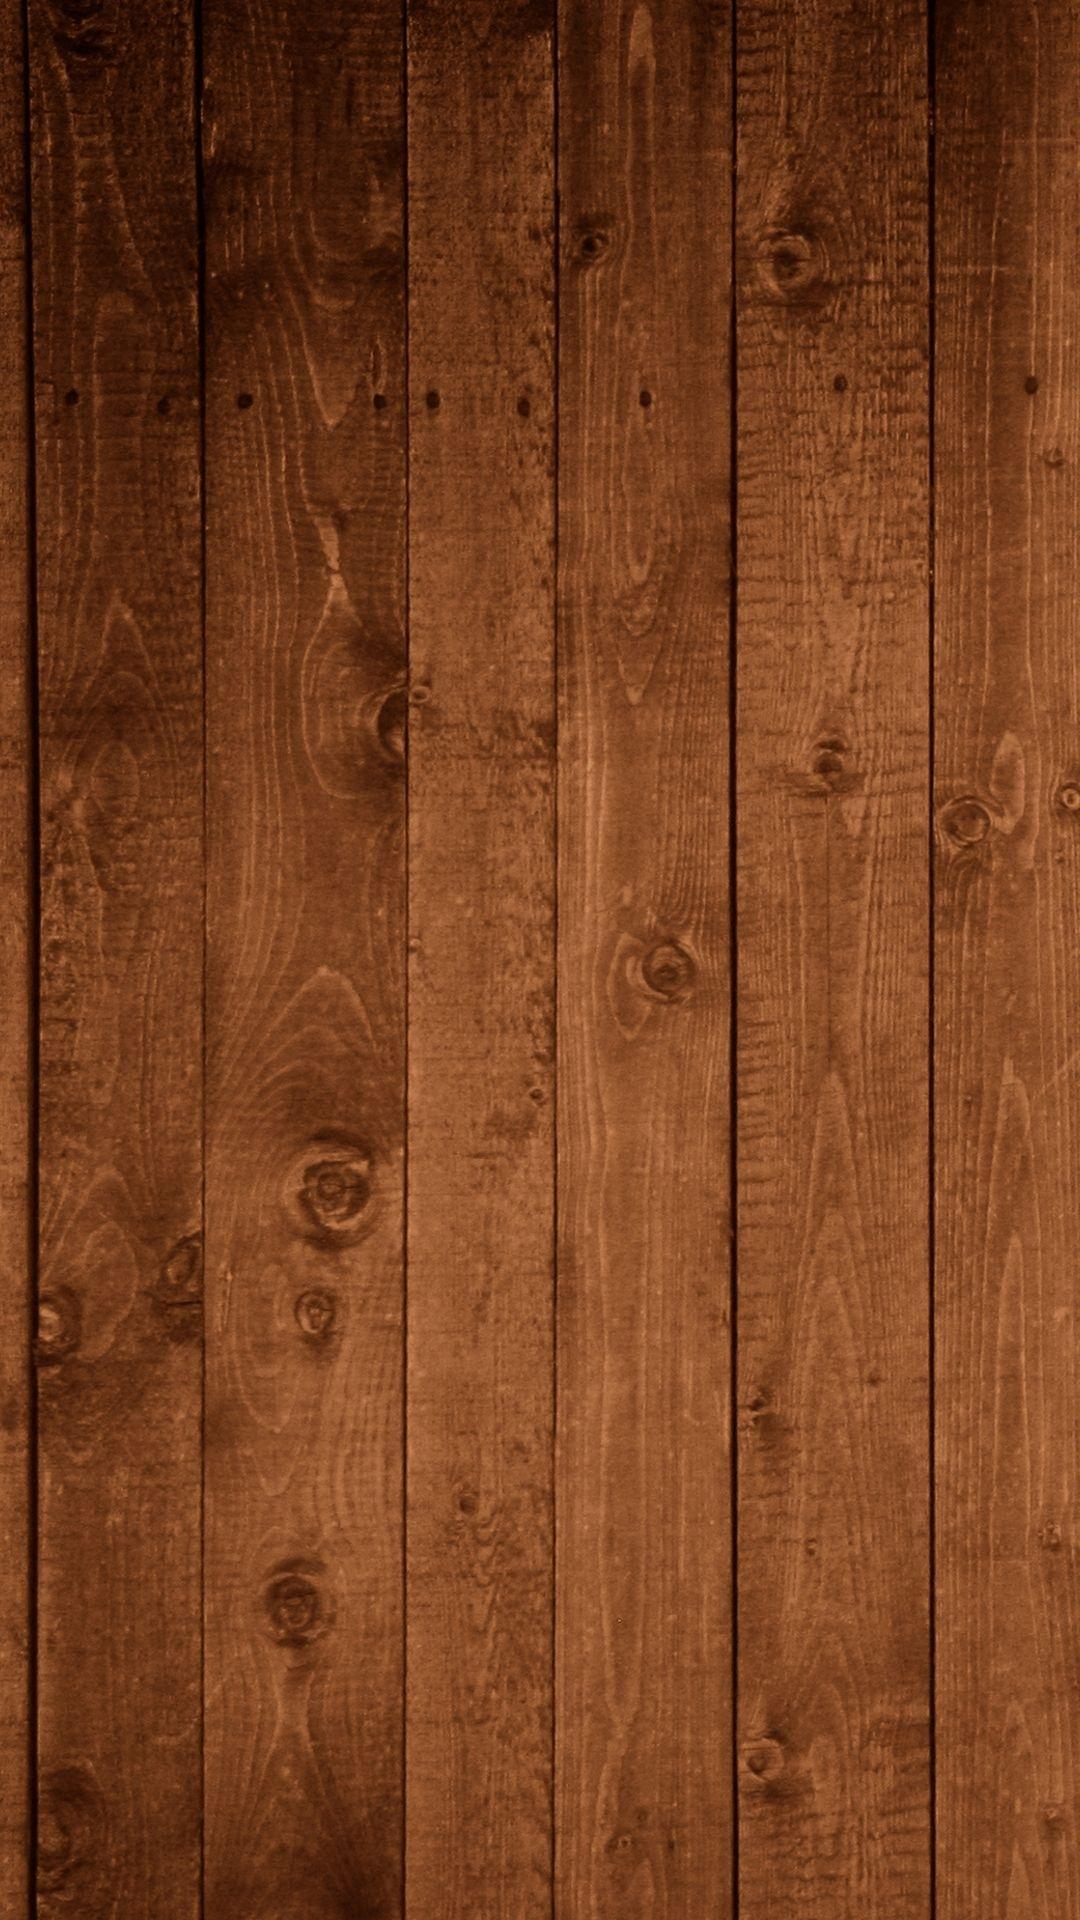 wood grain texture wallpaper | iphone wallpaper